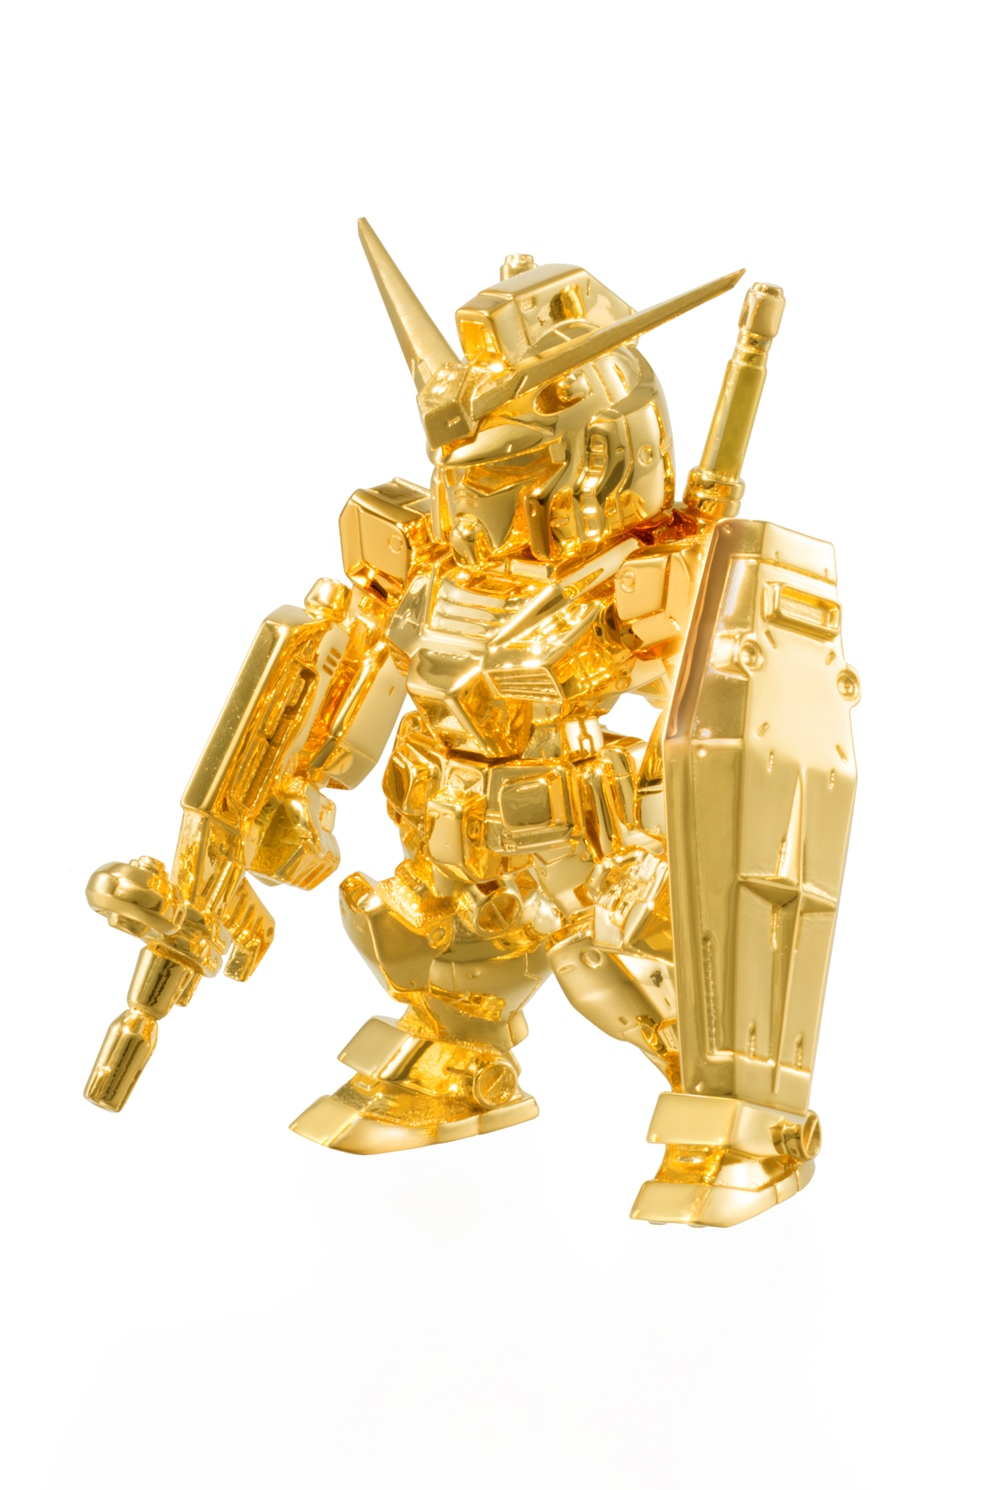 The Art Of Gundam Gundam Converge Ver Gold And Ver